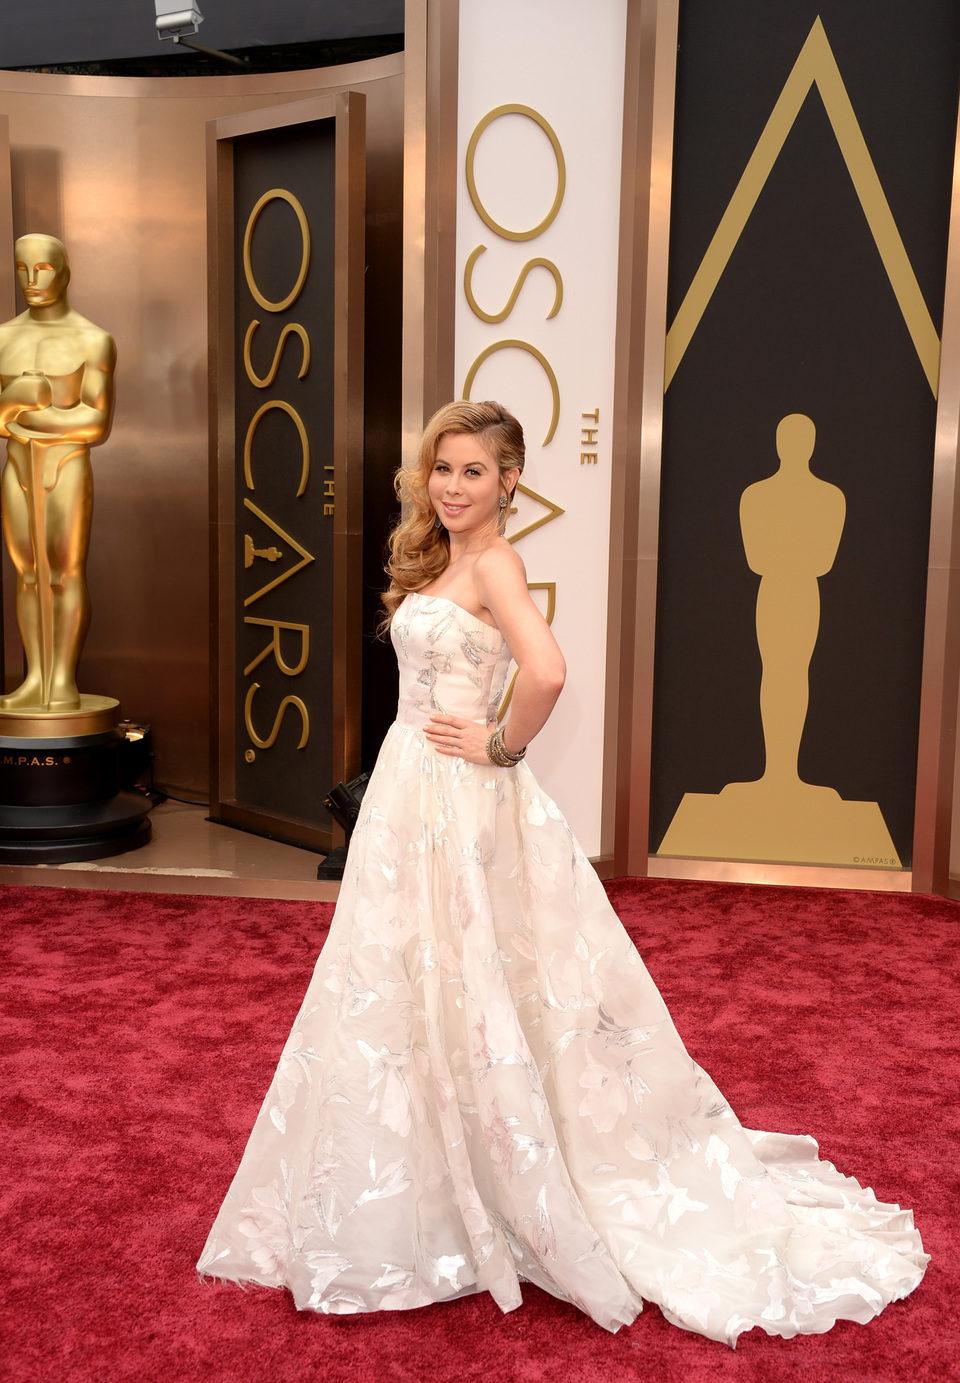 Tara Lipinski on the red carpet at the 2014 Oscars